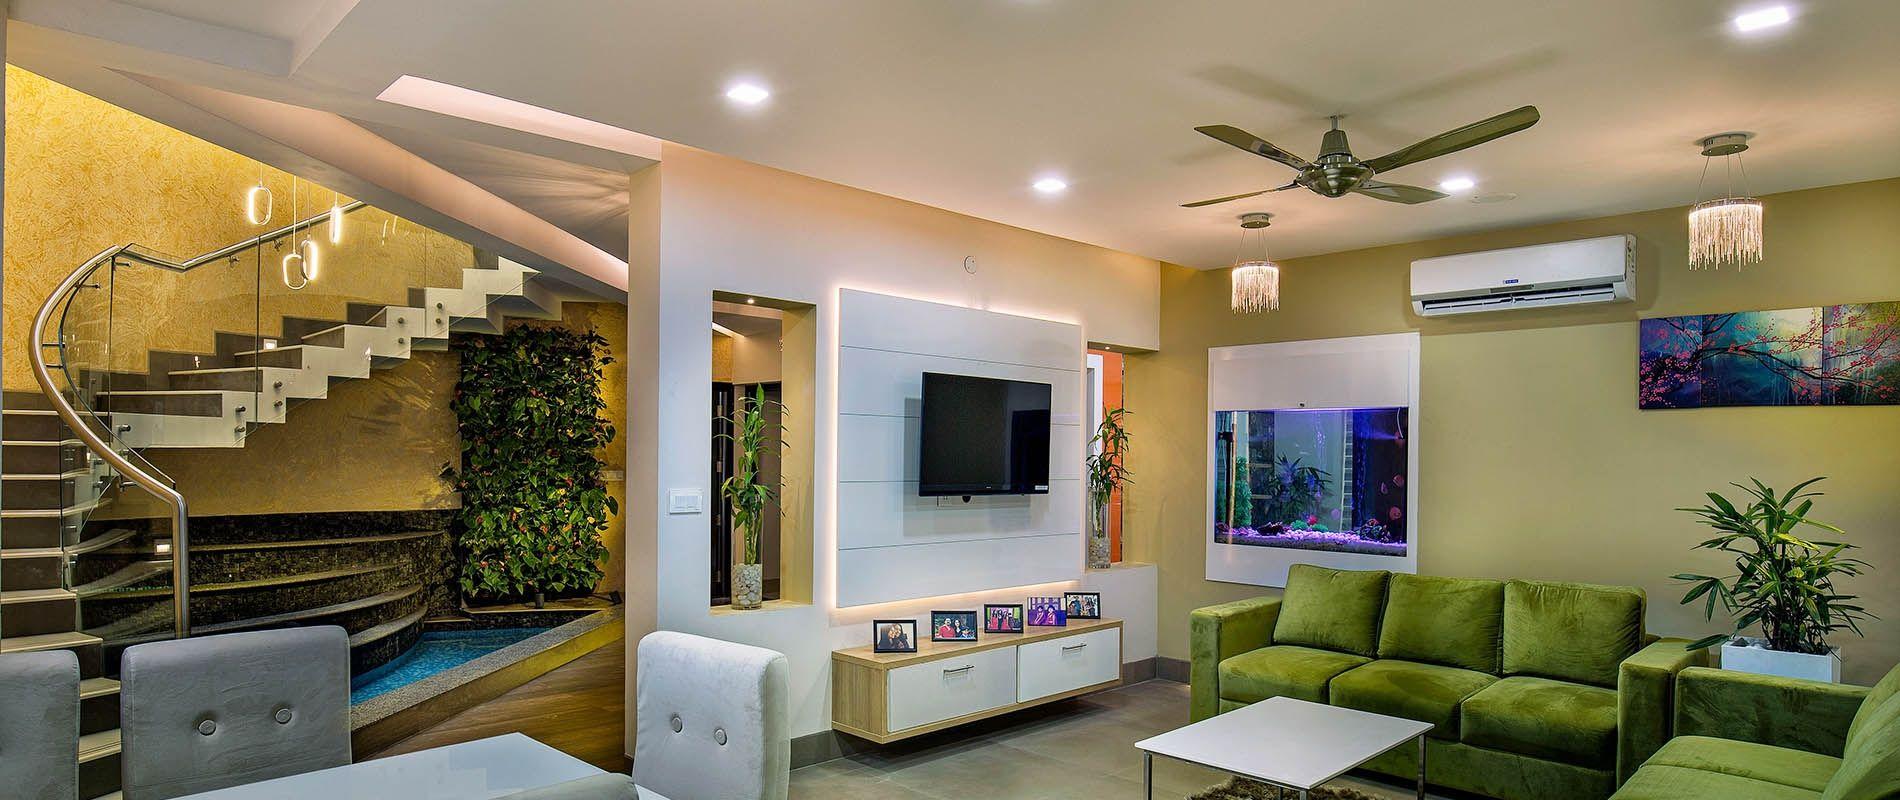 Top Home Interior Designer In Gurgaon Interior Design Hd Home